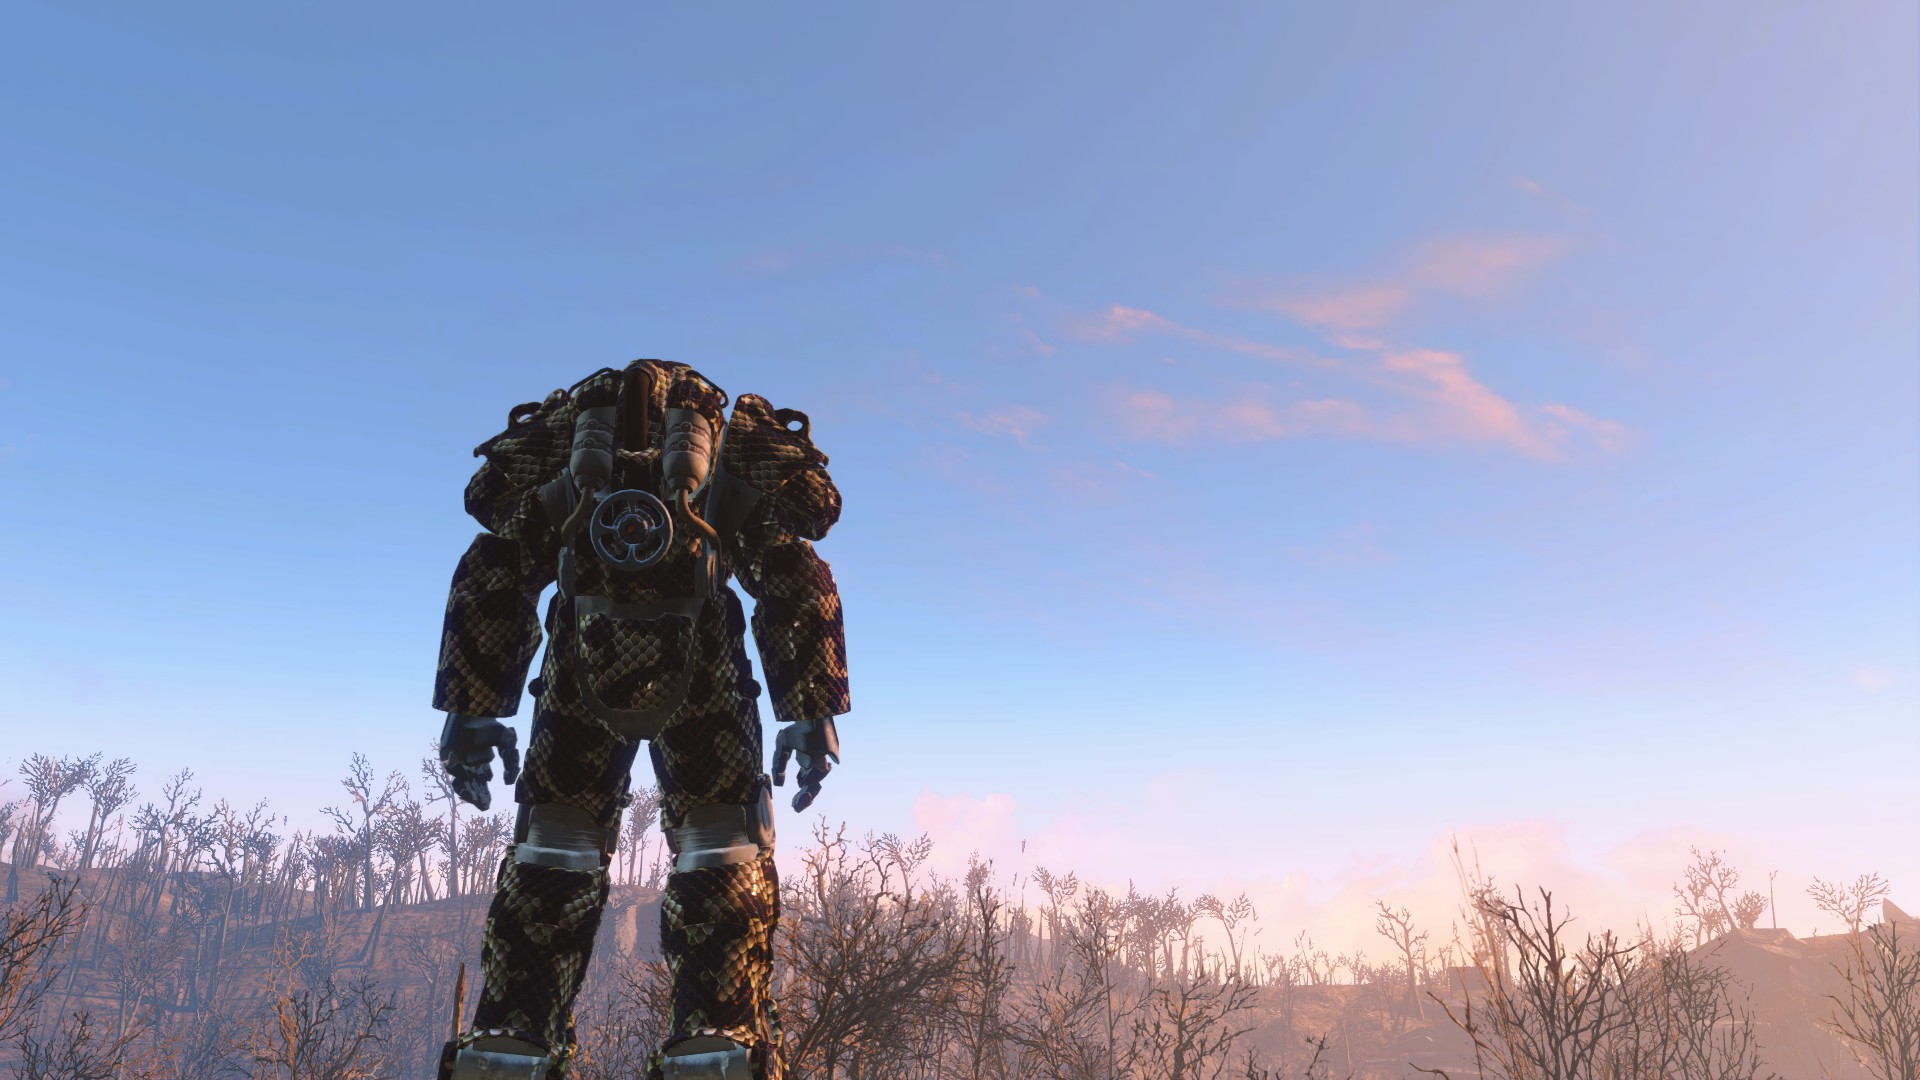 20190421200855_1.jpg - Fallout 4